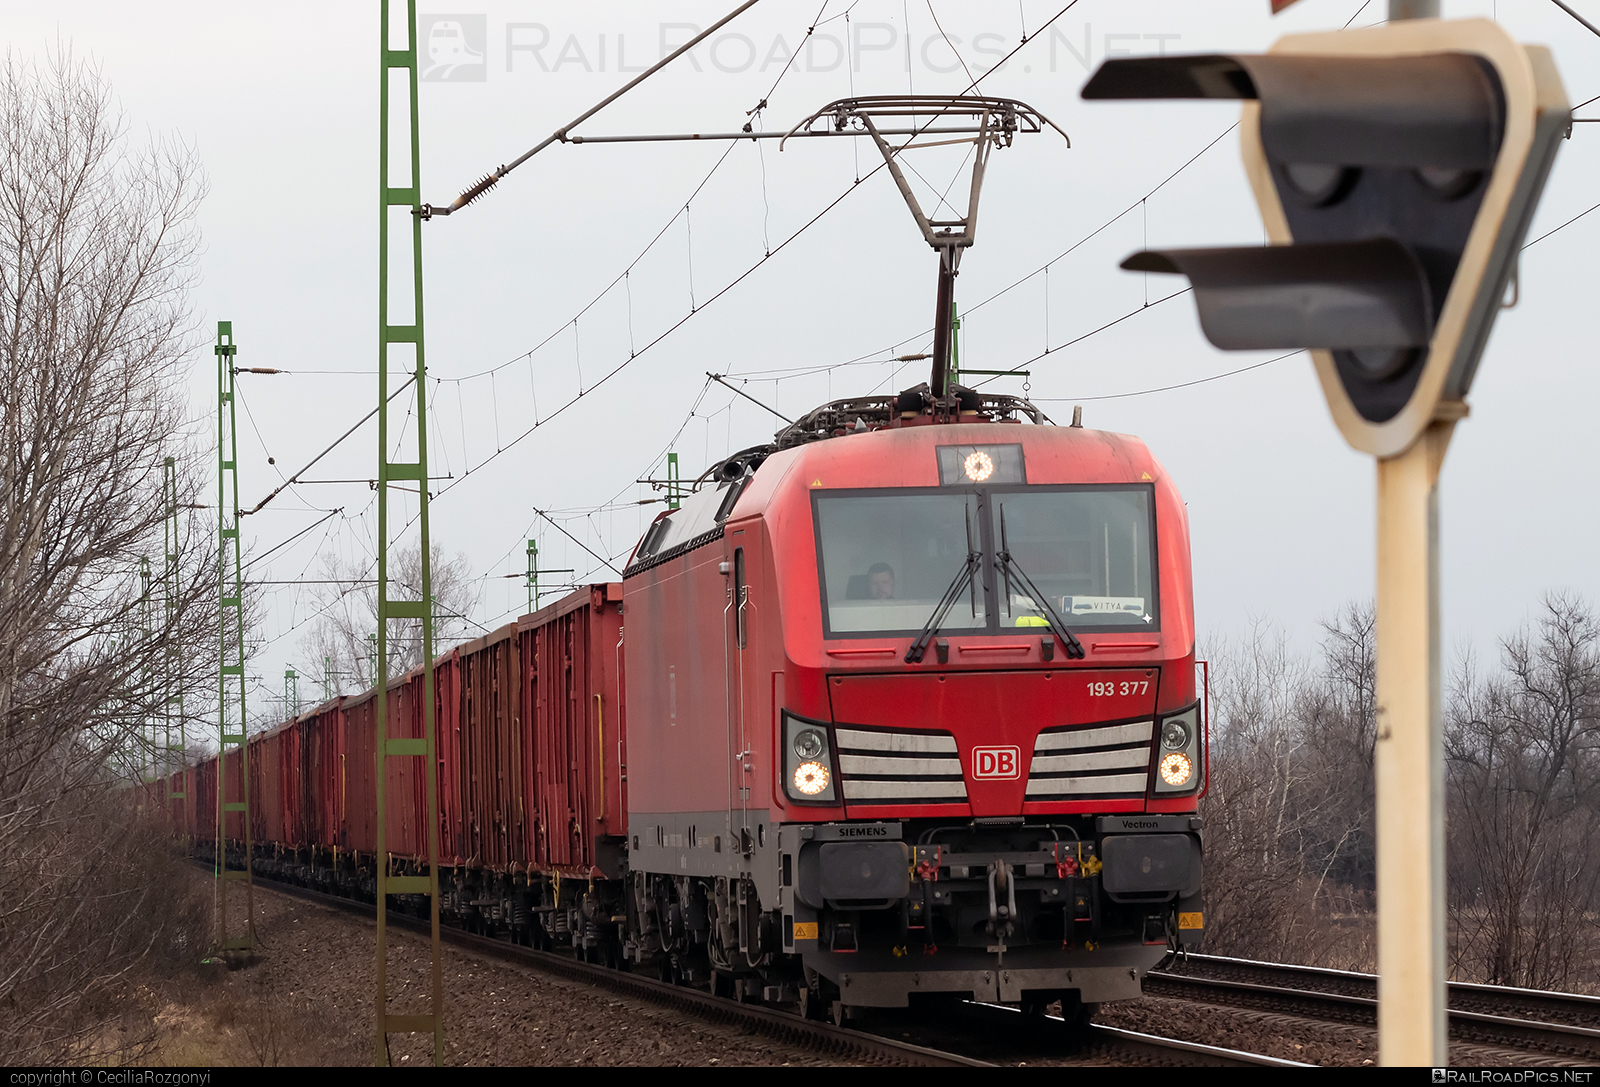 Siemens Vectron MS - 193 377 operated by DB Cargo Hungária Kft #db #dbcargo #dbcargohungaria #deutschebahn #openwagon #siemens #siemensvectron #siemensvectronms #vectron #vectronms